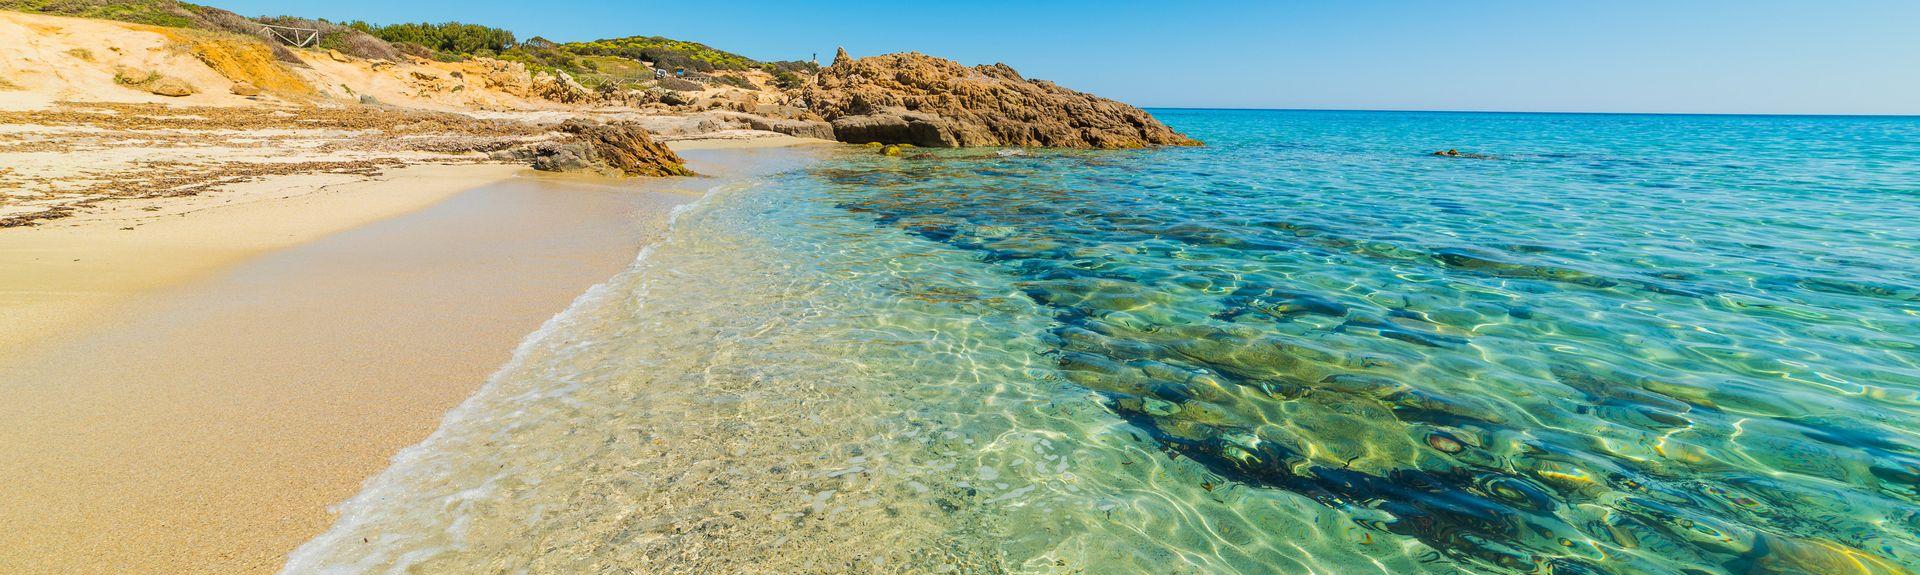 Mari Pintau Beach, Quartu Sant'Elena, Italy